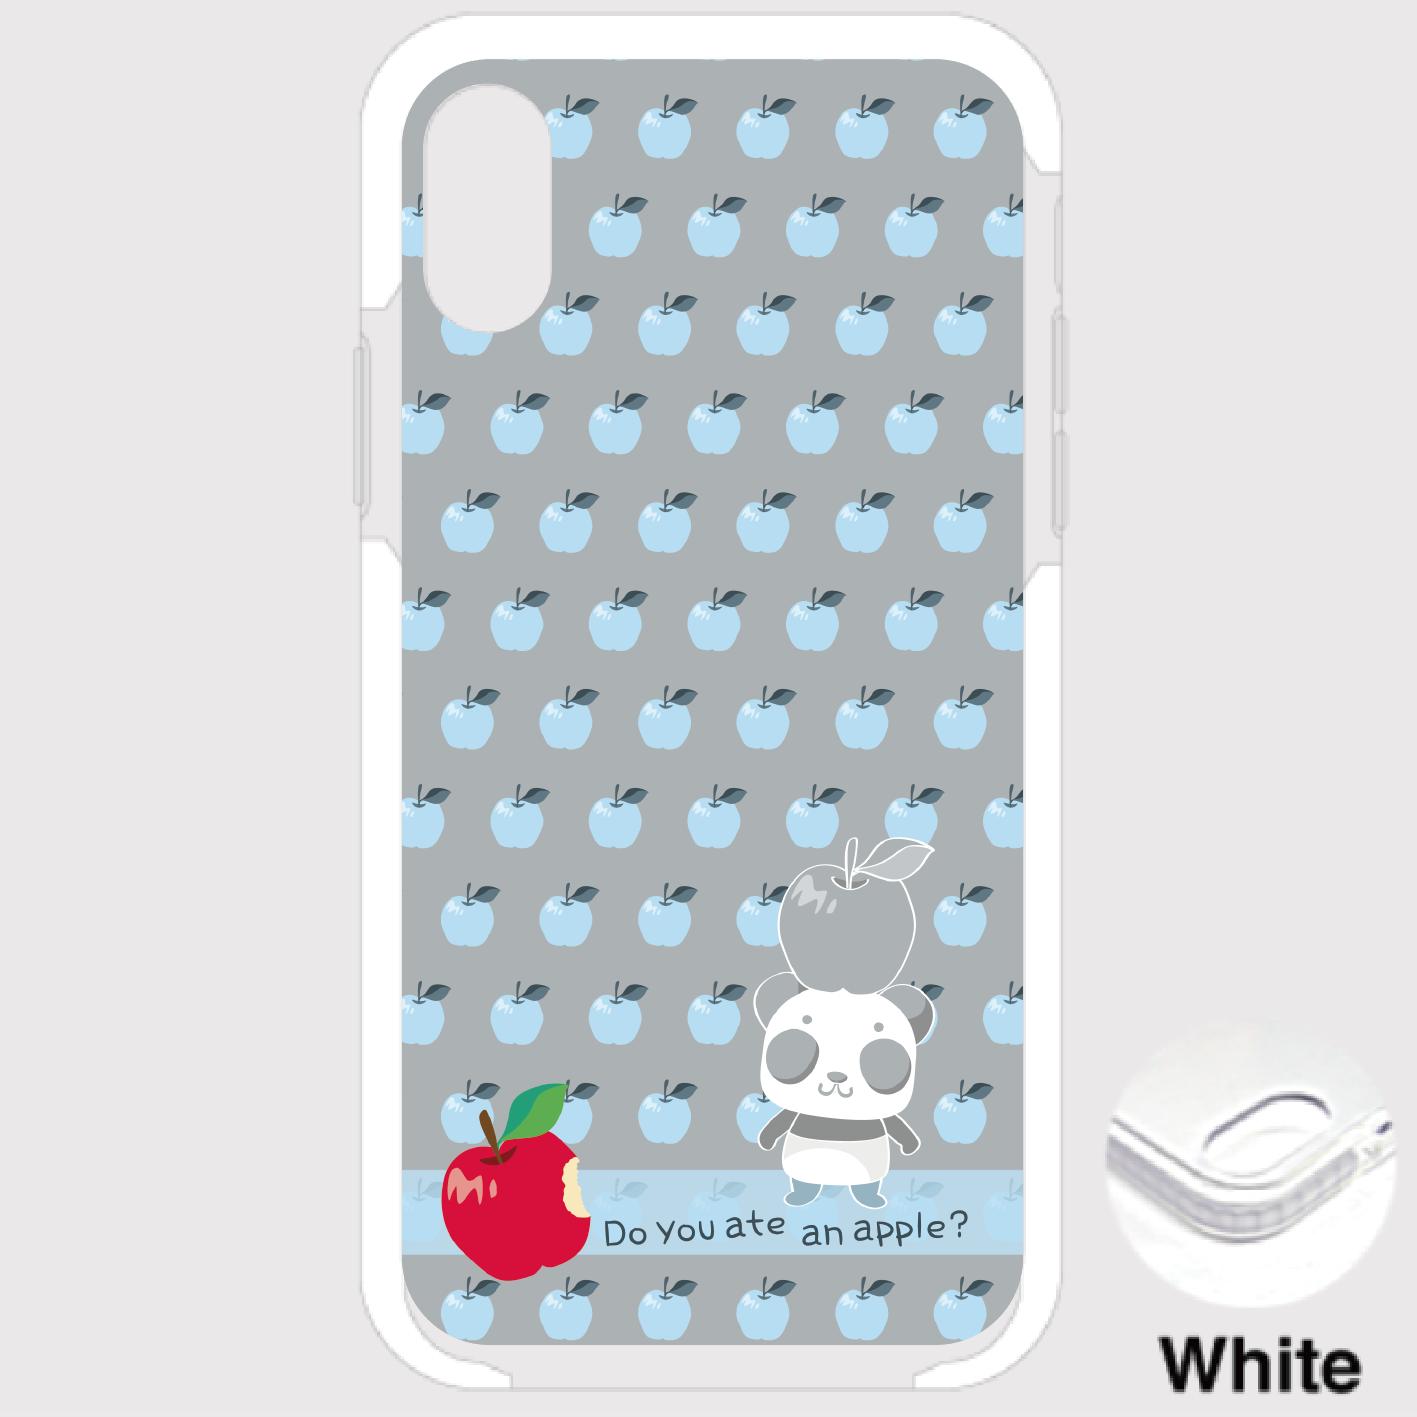 B*iPhone XSMax/8Plus/7Plus*9-19Bxリンゴを食べたのは誰?*水色*クッションバンパーケース